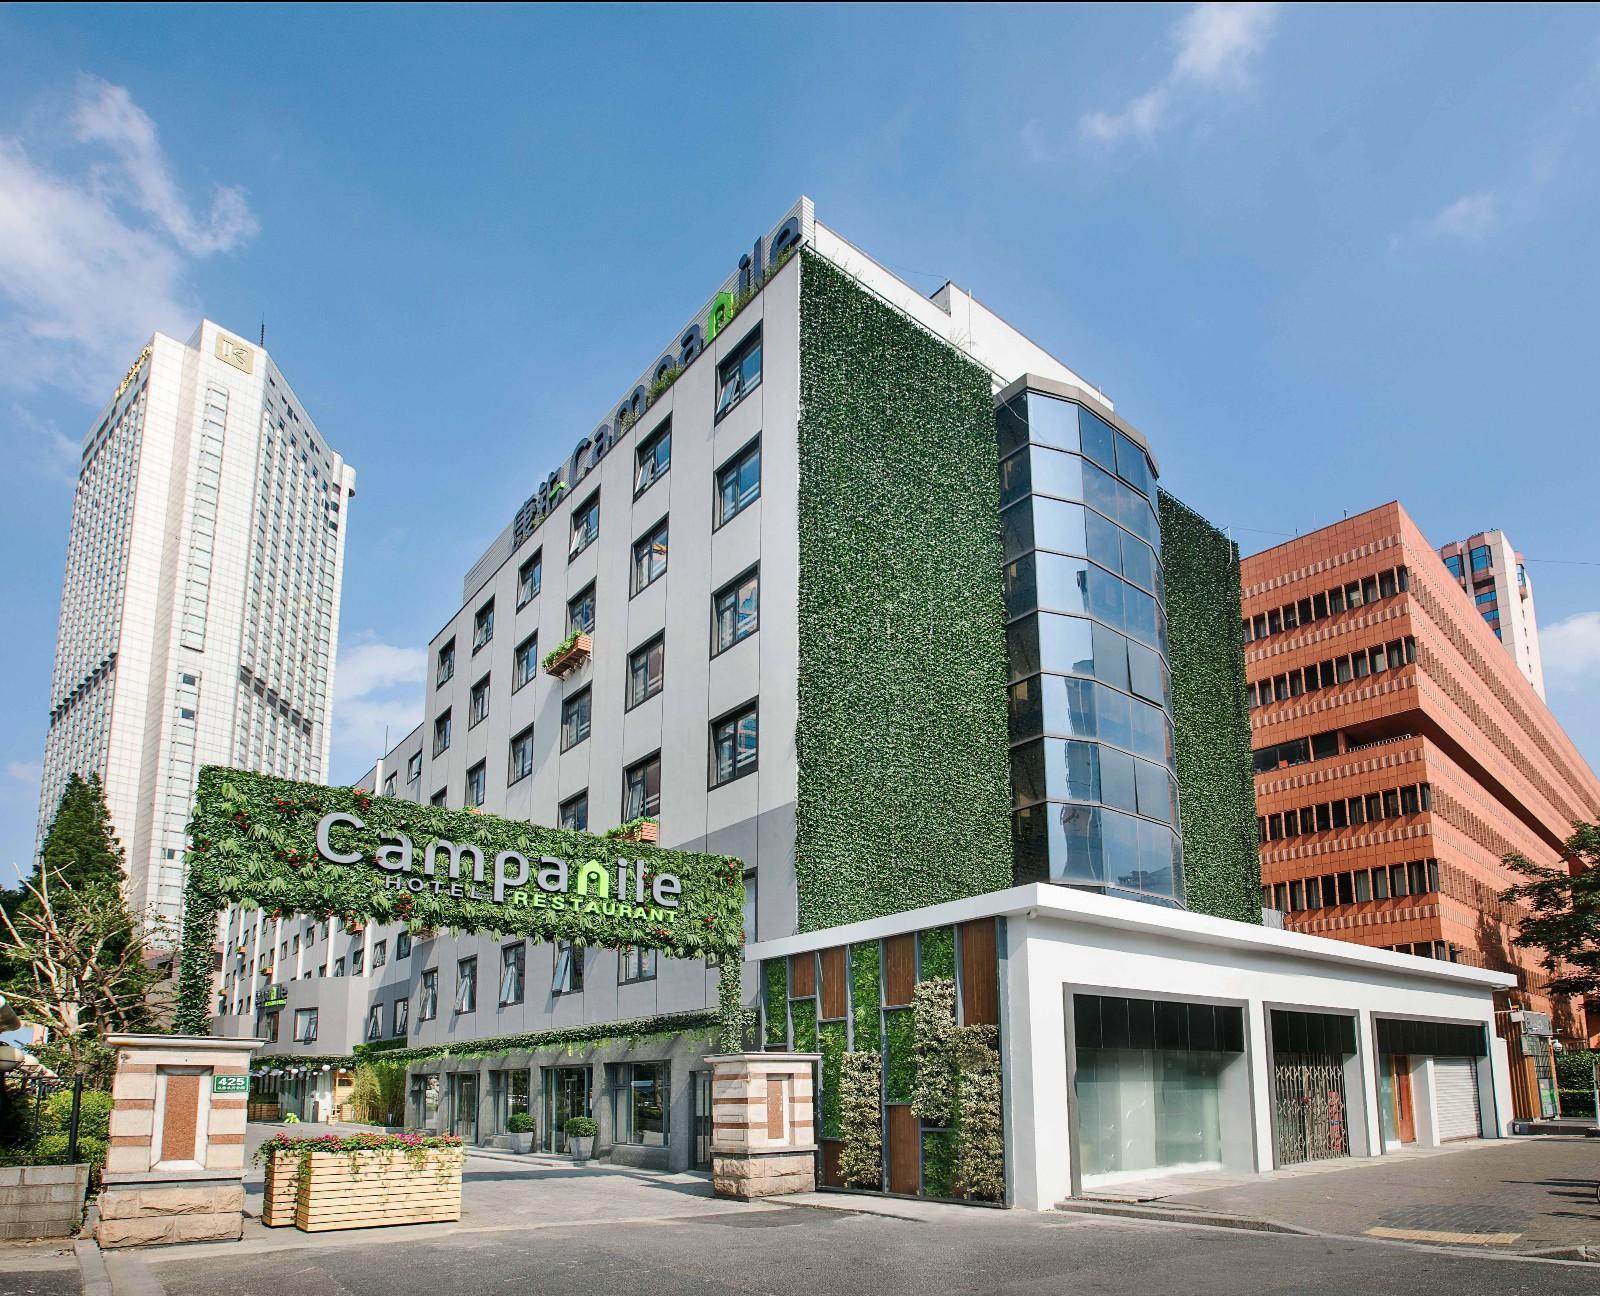 Campanile Hotel Jing'an